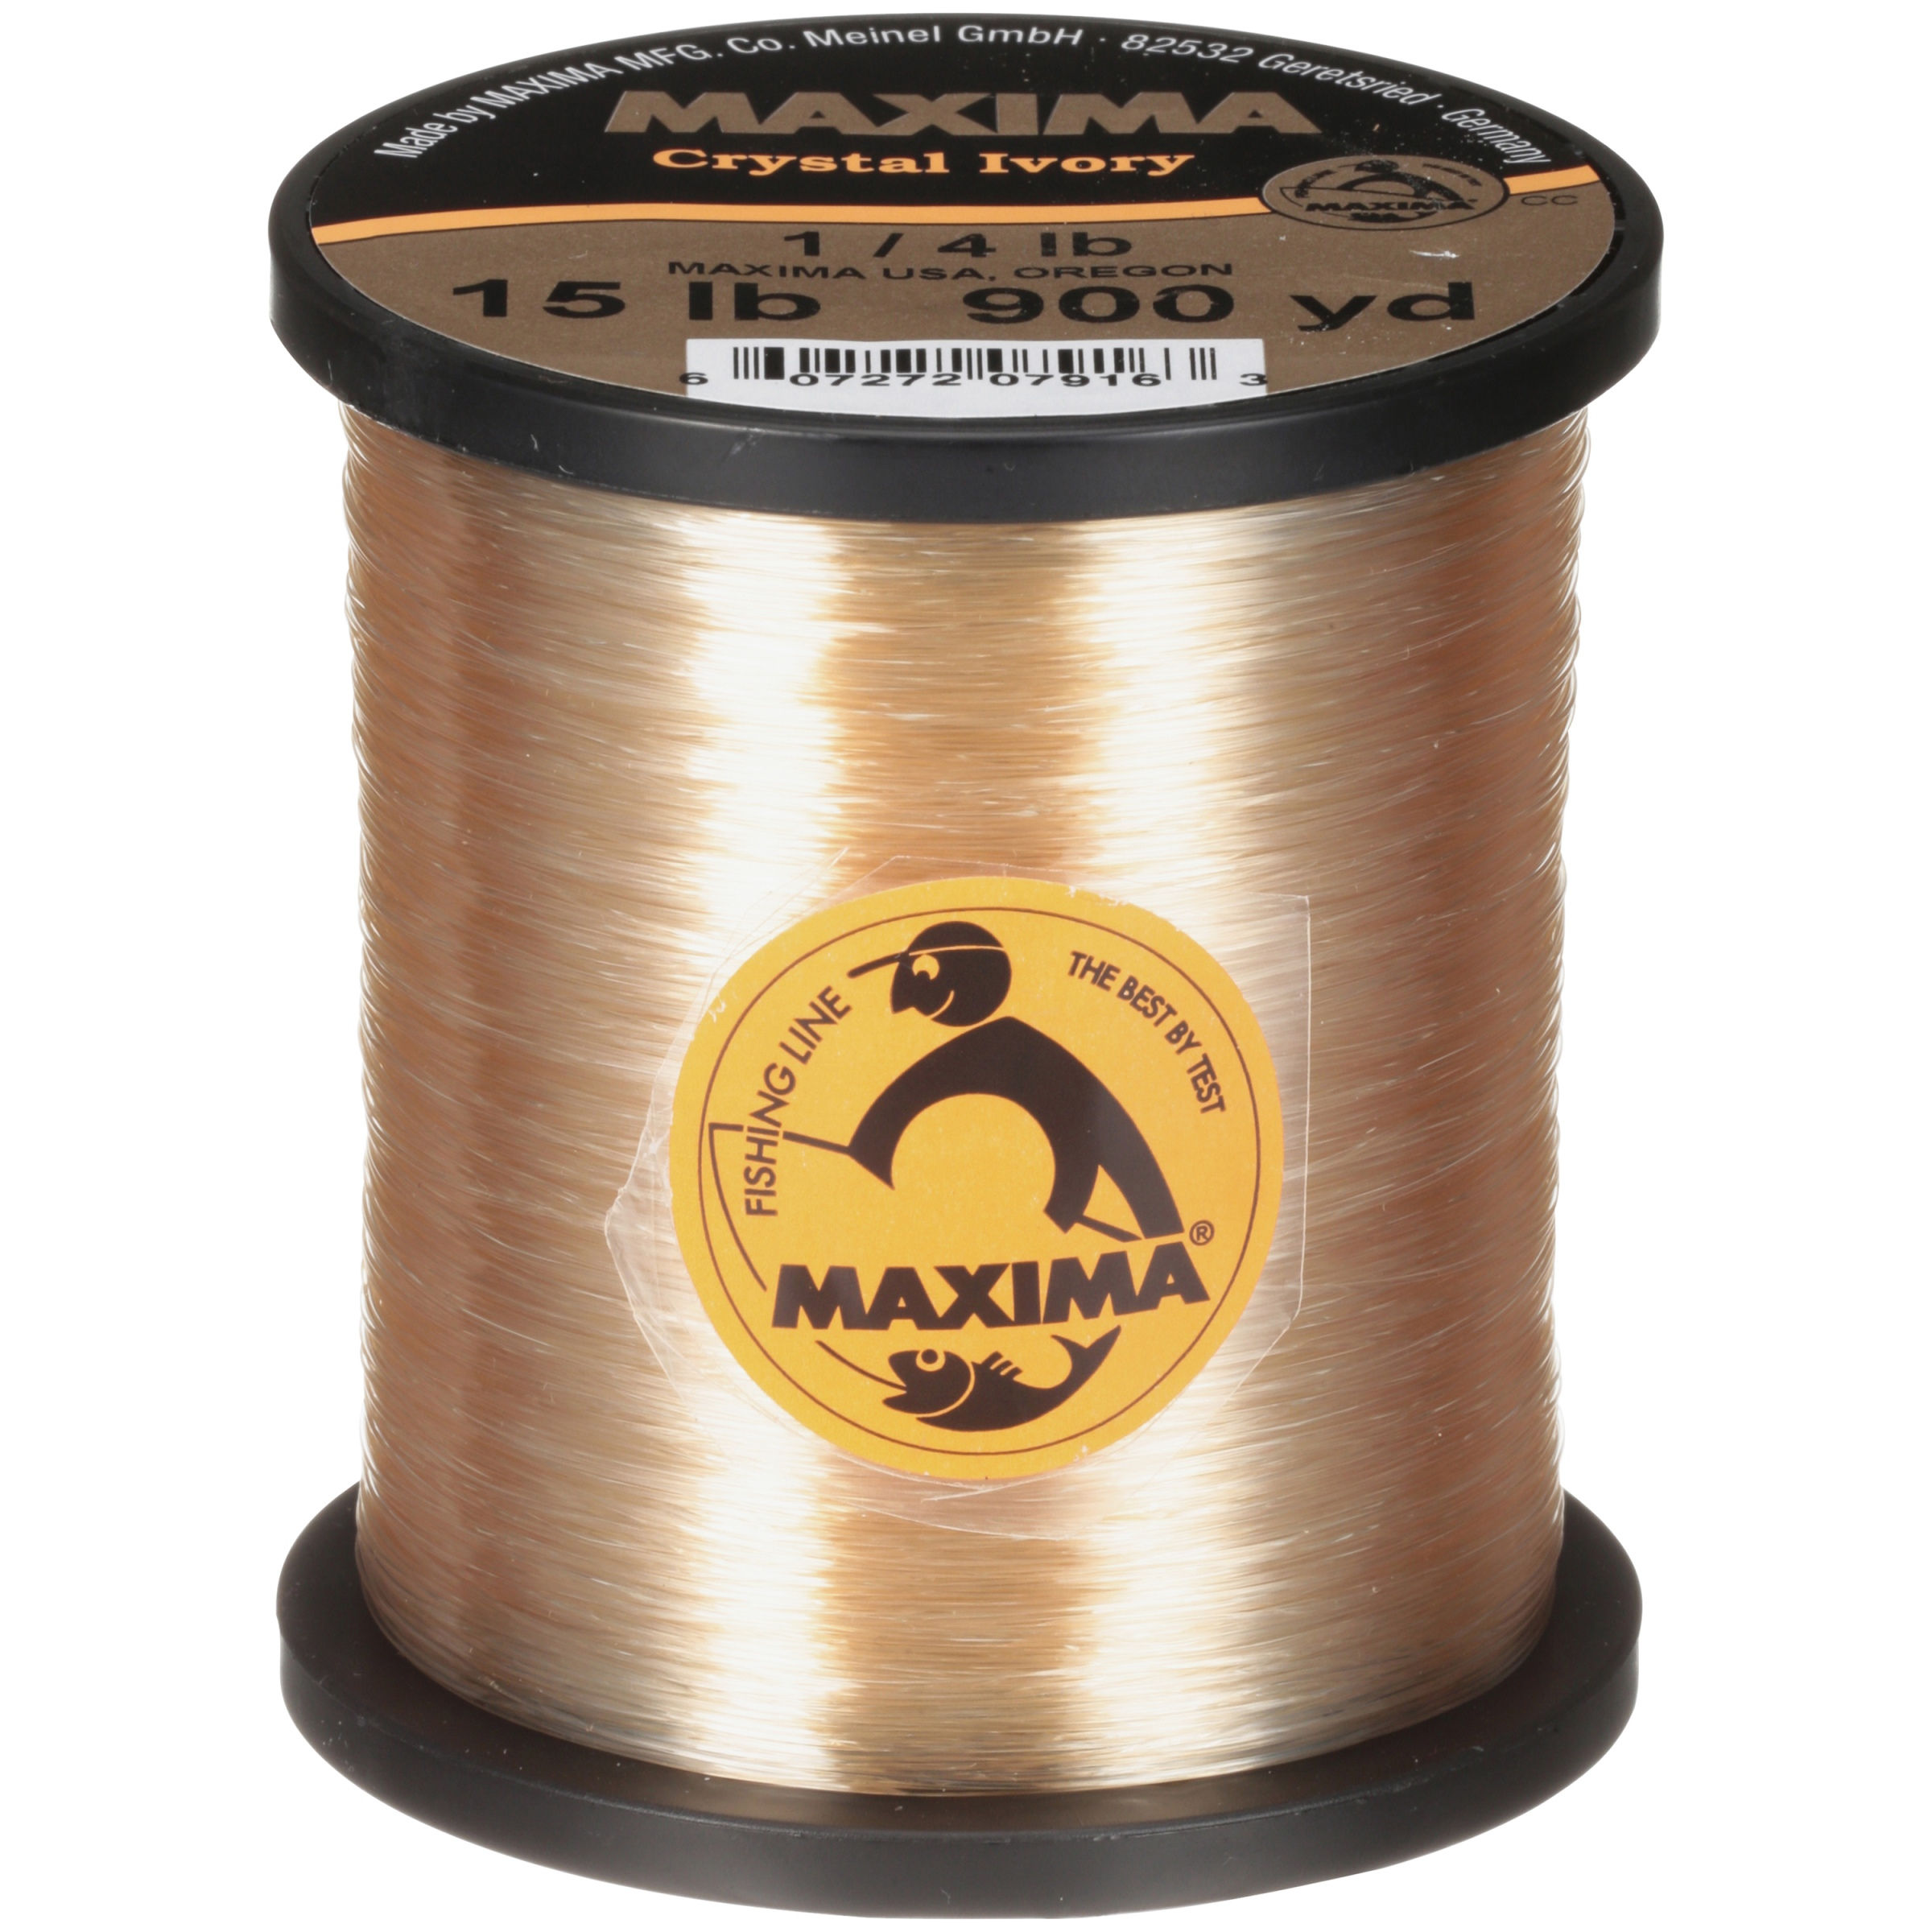 Maxima Crystal Ivory 15 lb Fishing Line by Maxima Mfg. Co.